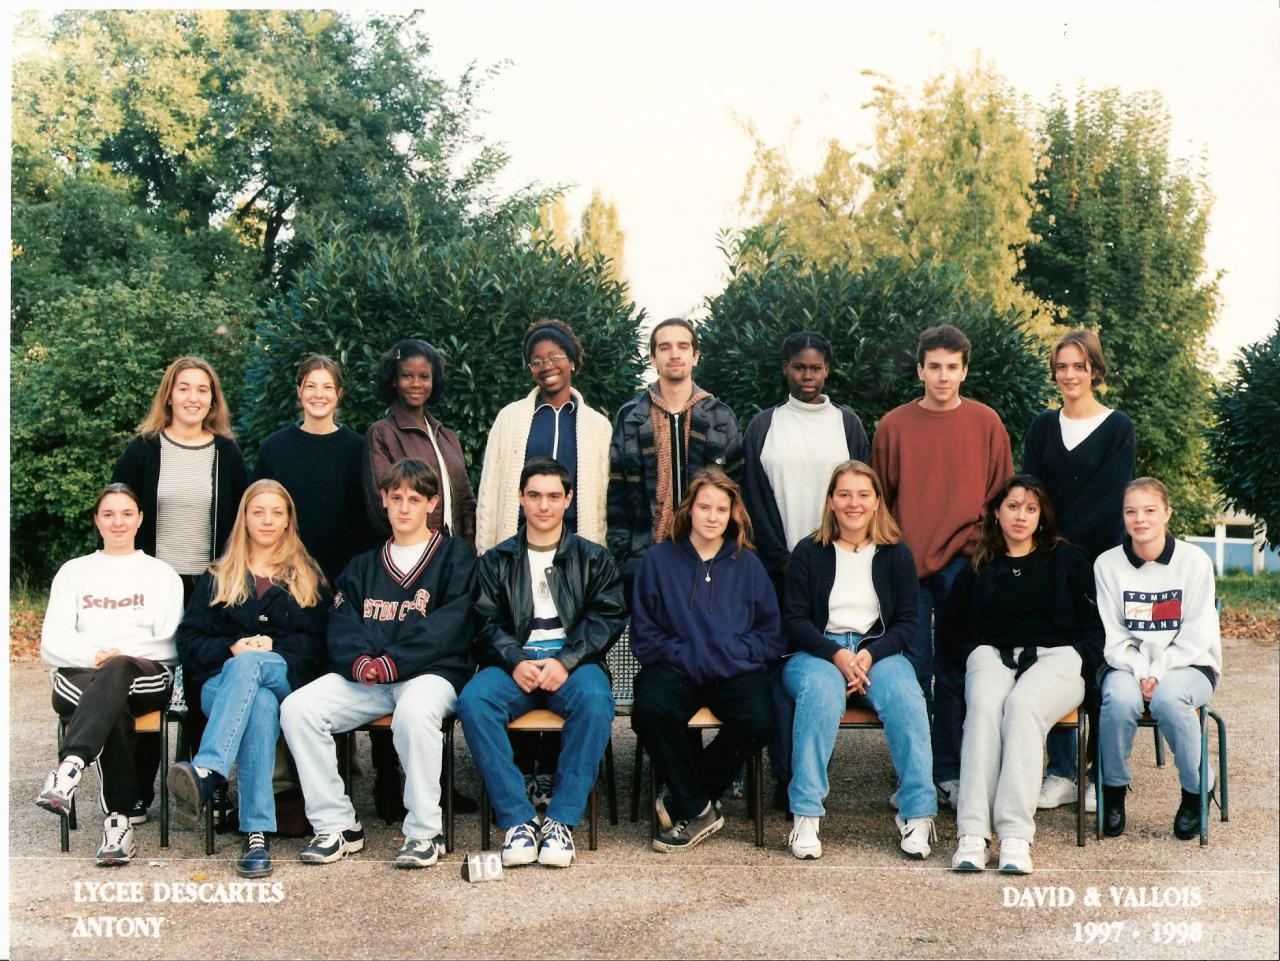 1998 - TL1 - DAVID